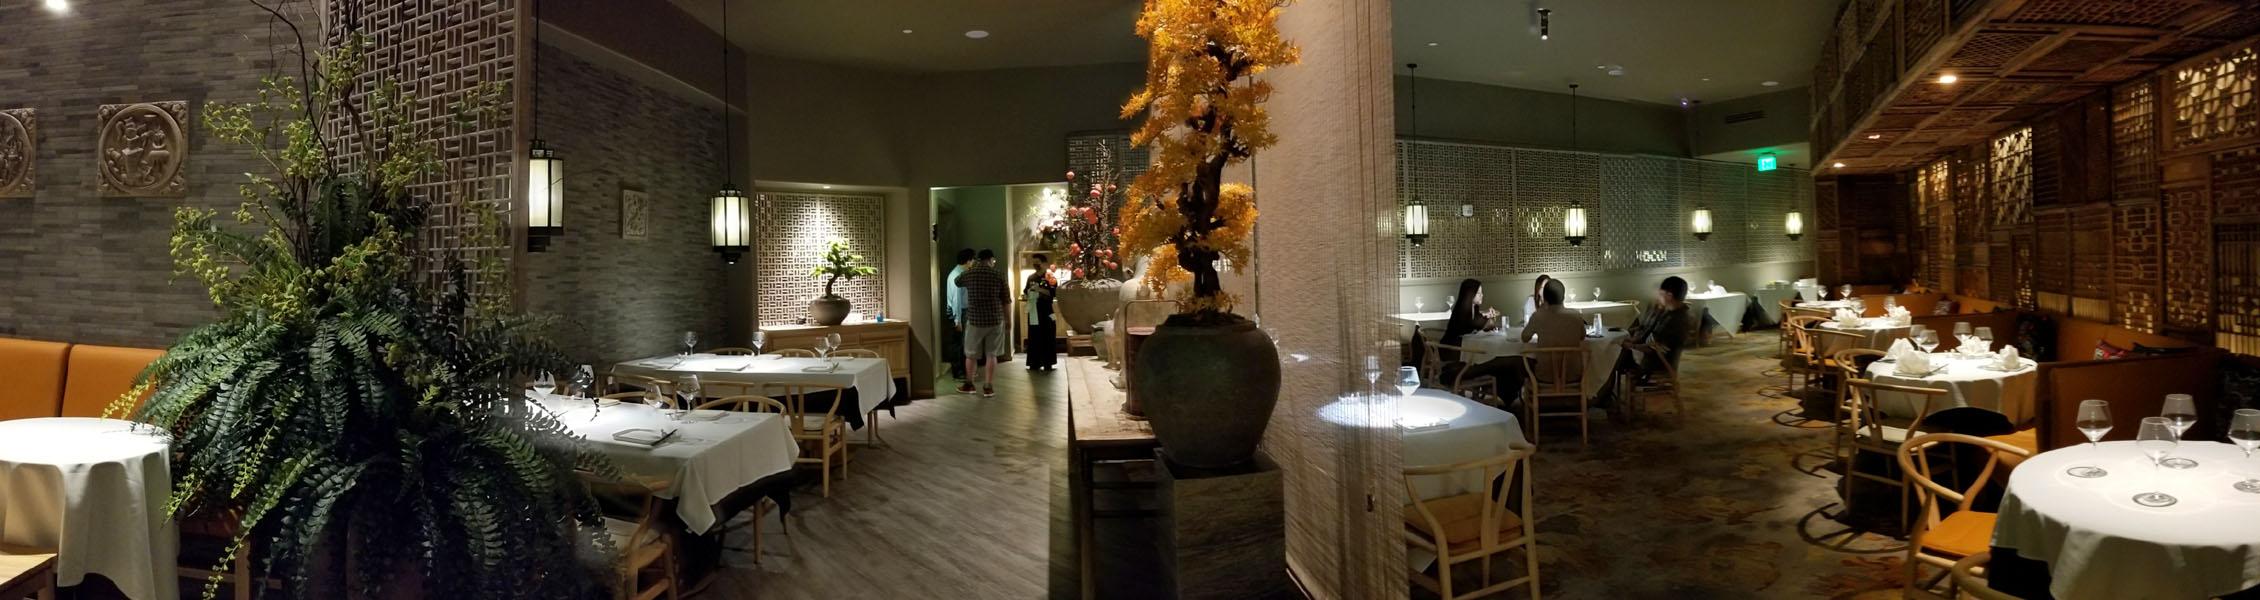 Chang'an Interior: Main Dining Area